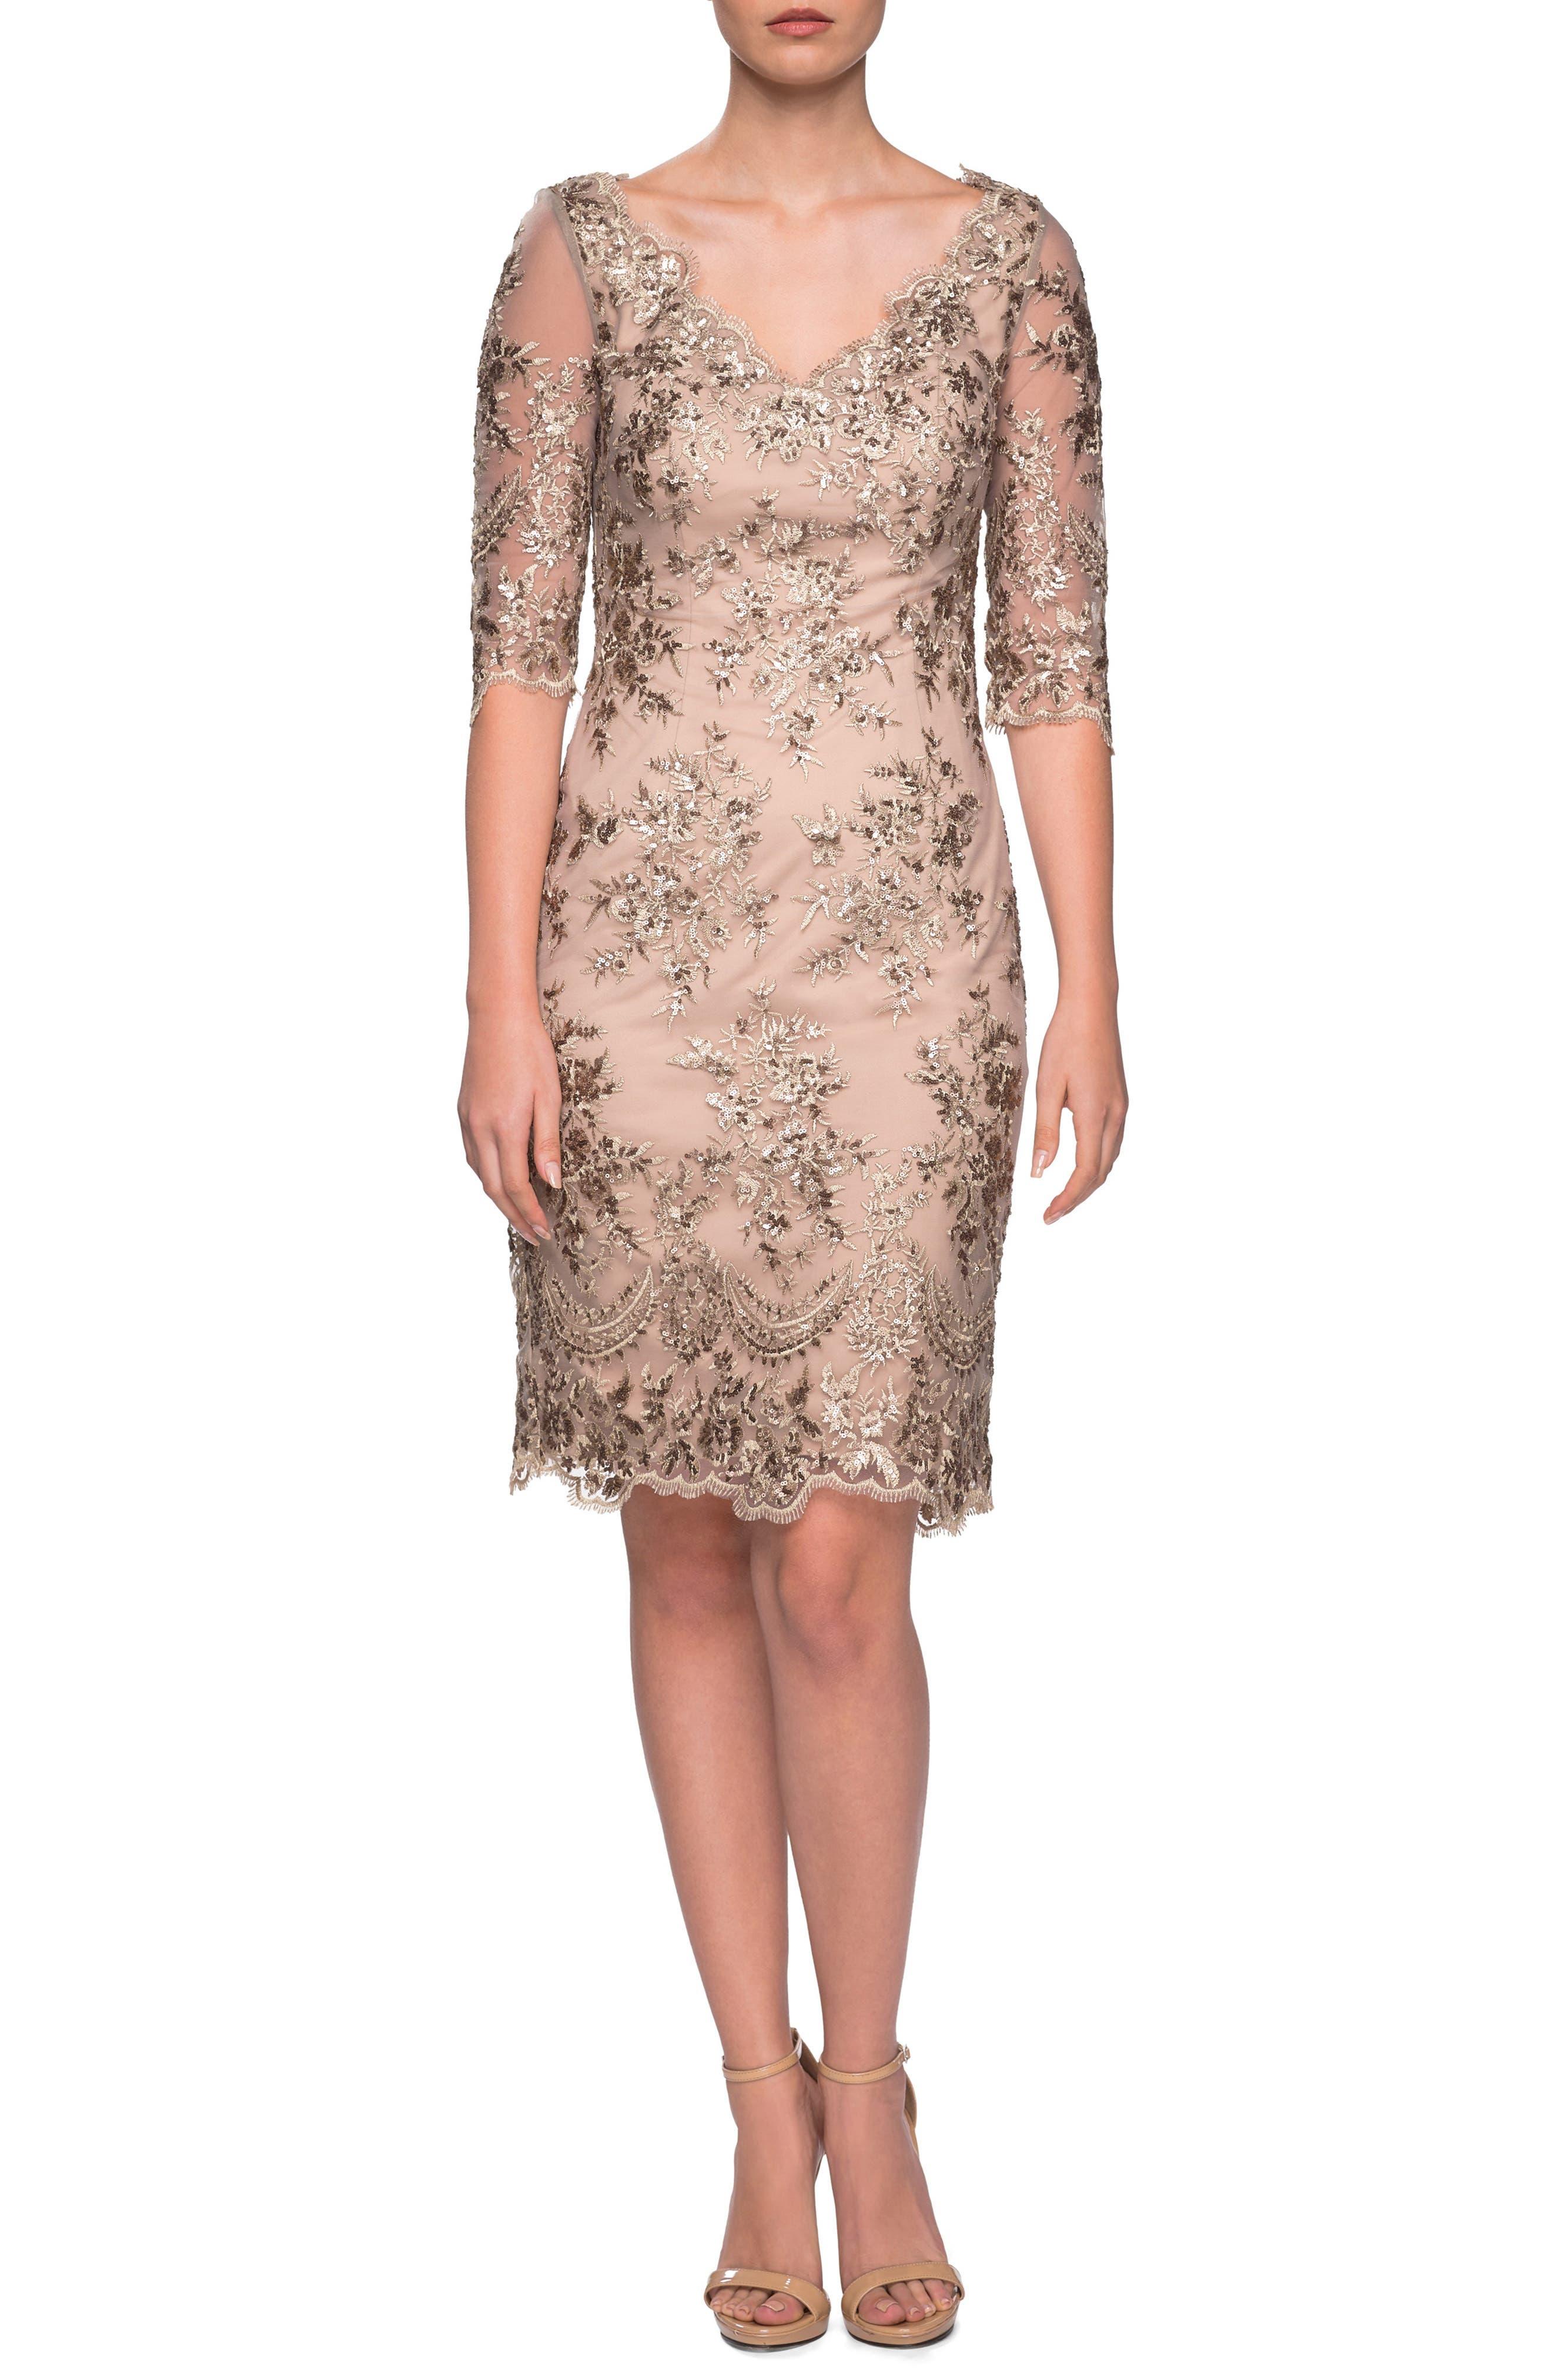 LA FEMME, Embroidered Lace Sheath Dress, Main thumbnail 1, color, GOLD/ NUDE